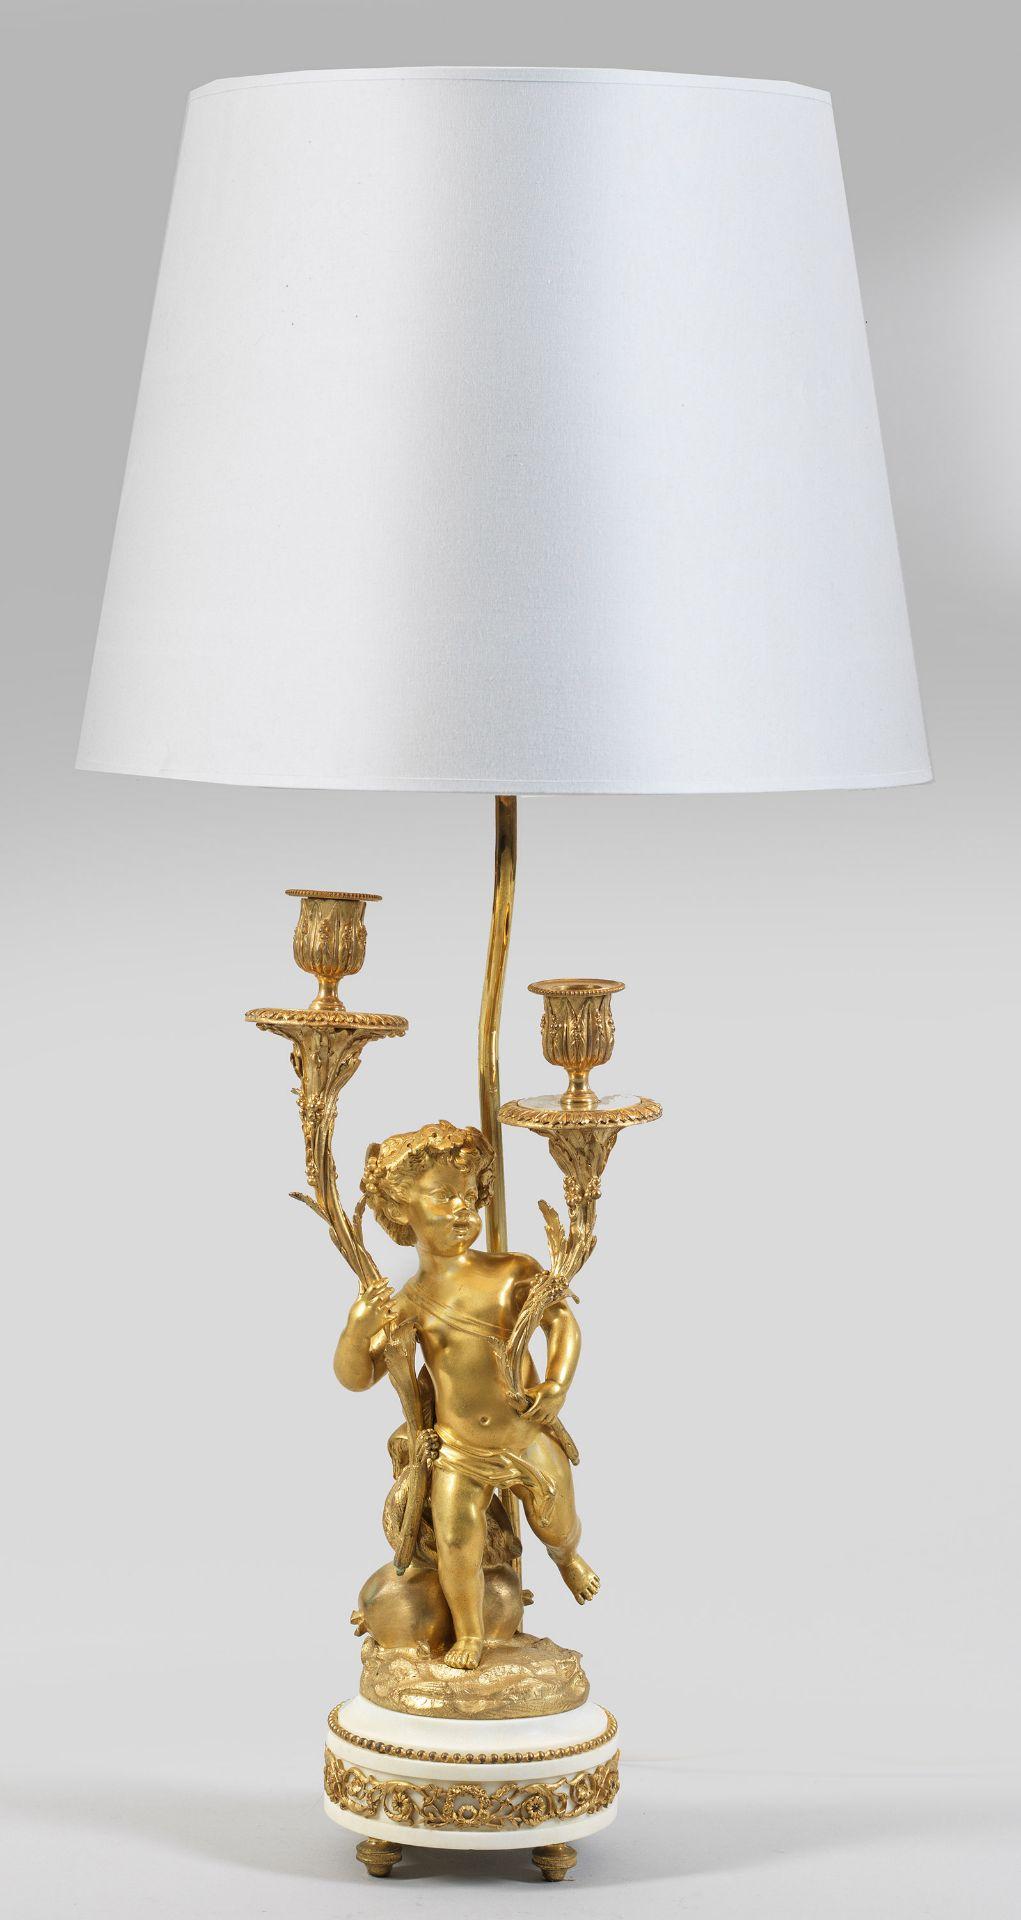 Große Louis XV-Tischlampe